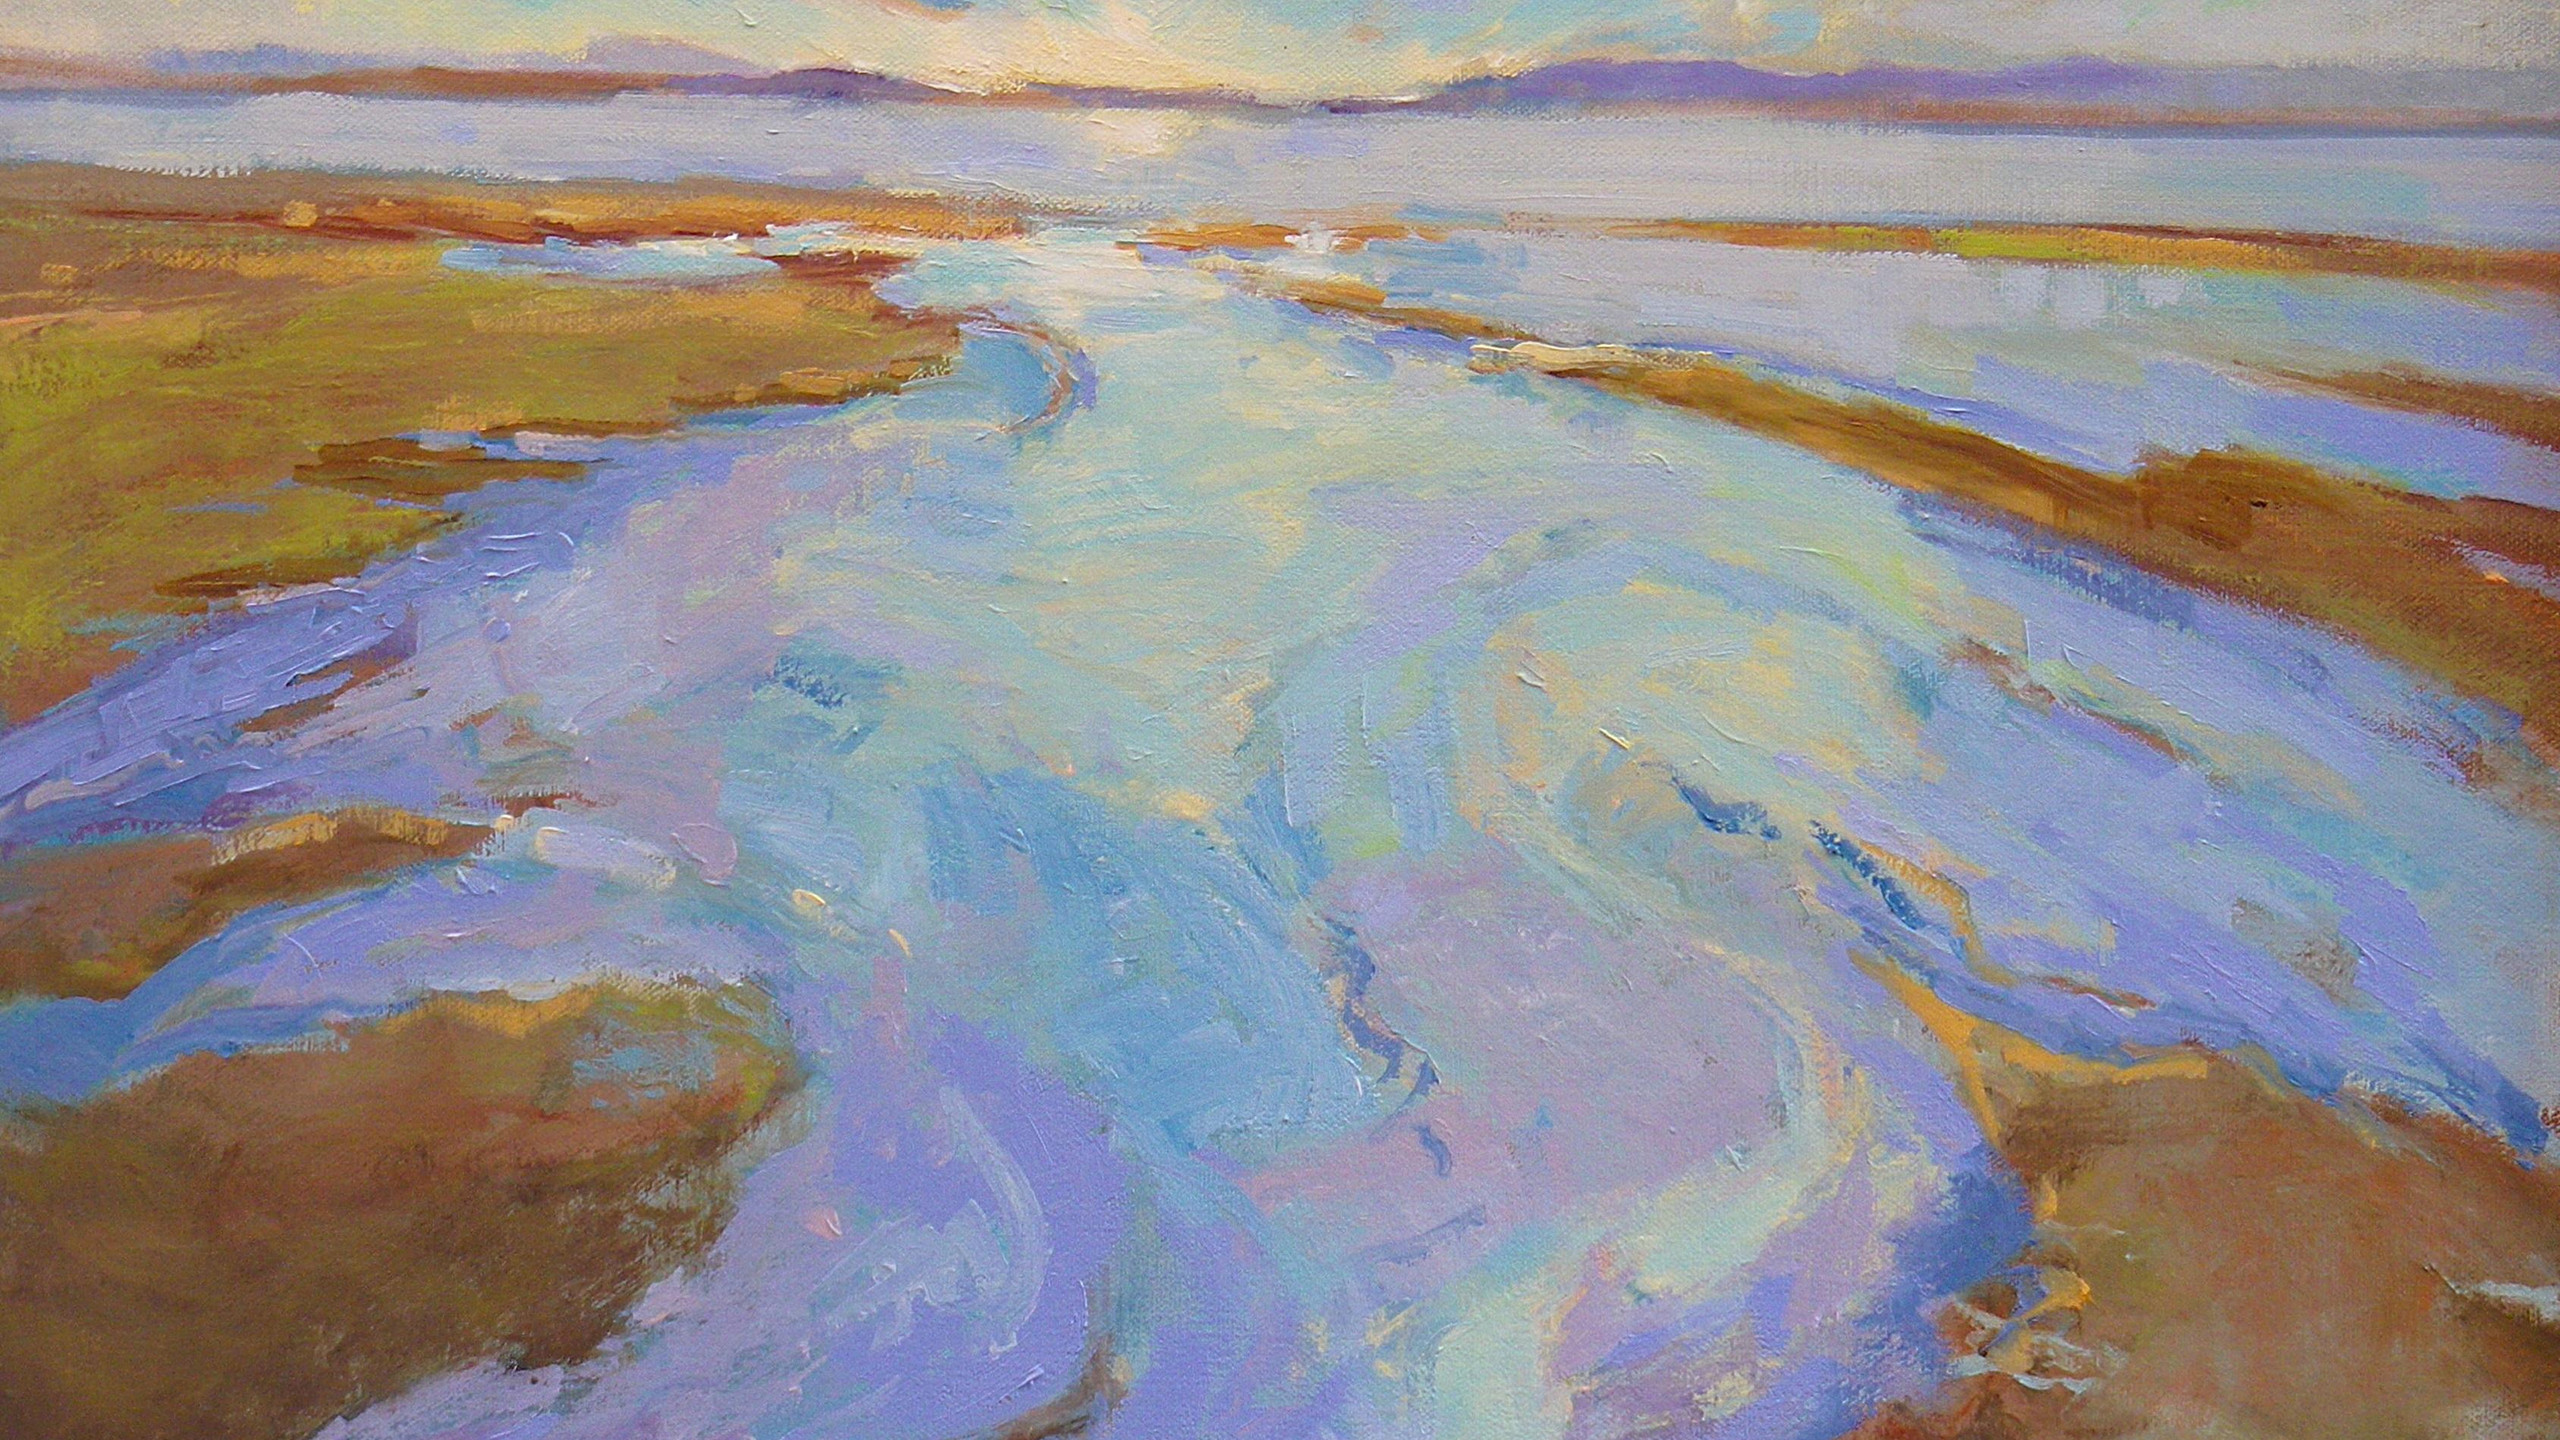 Colbeck, Lynda A - Colbeck Lynda Low Tide Sunset 20x30 oil